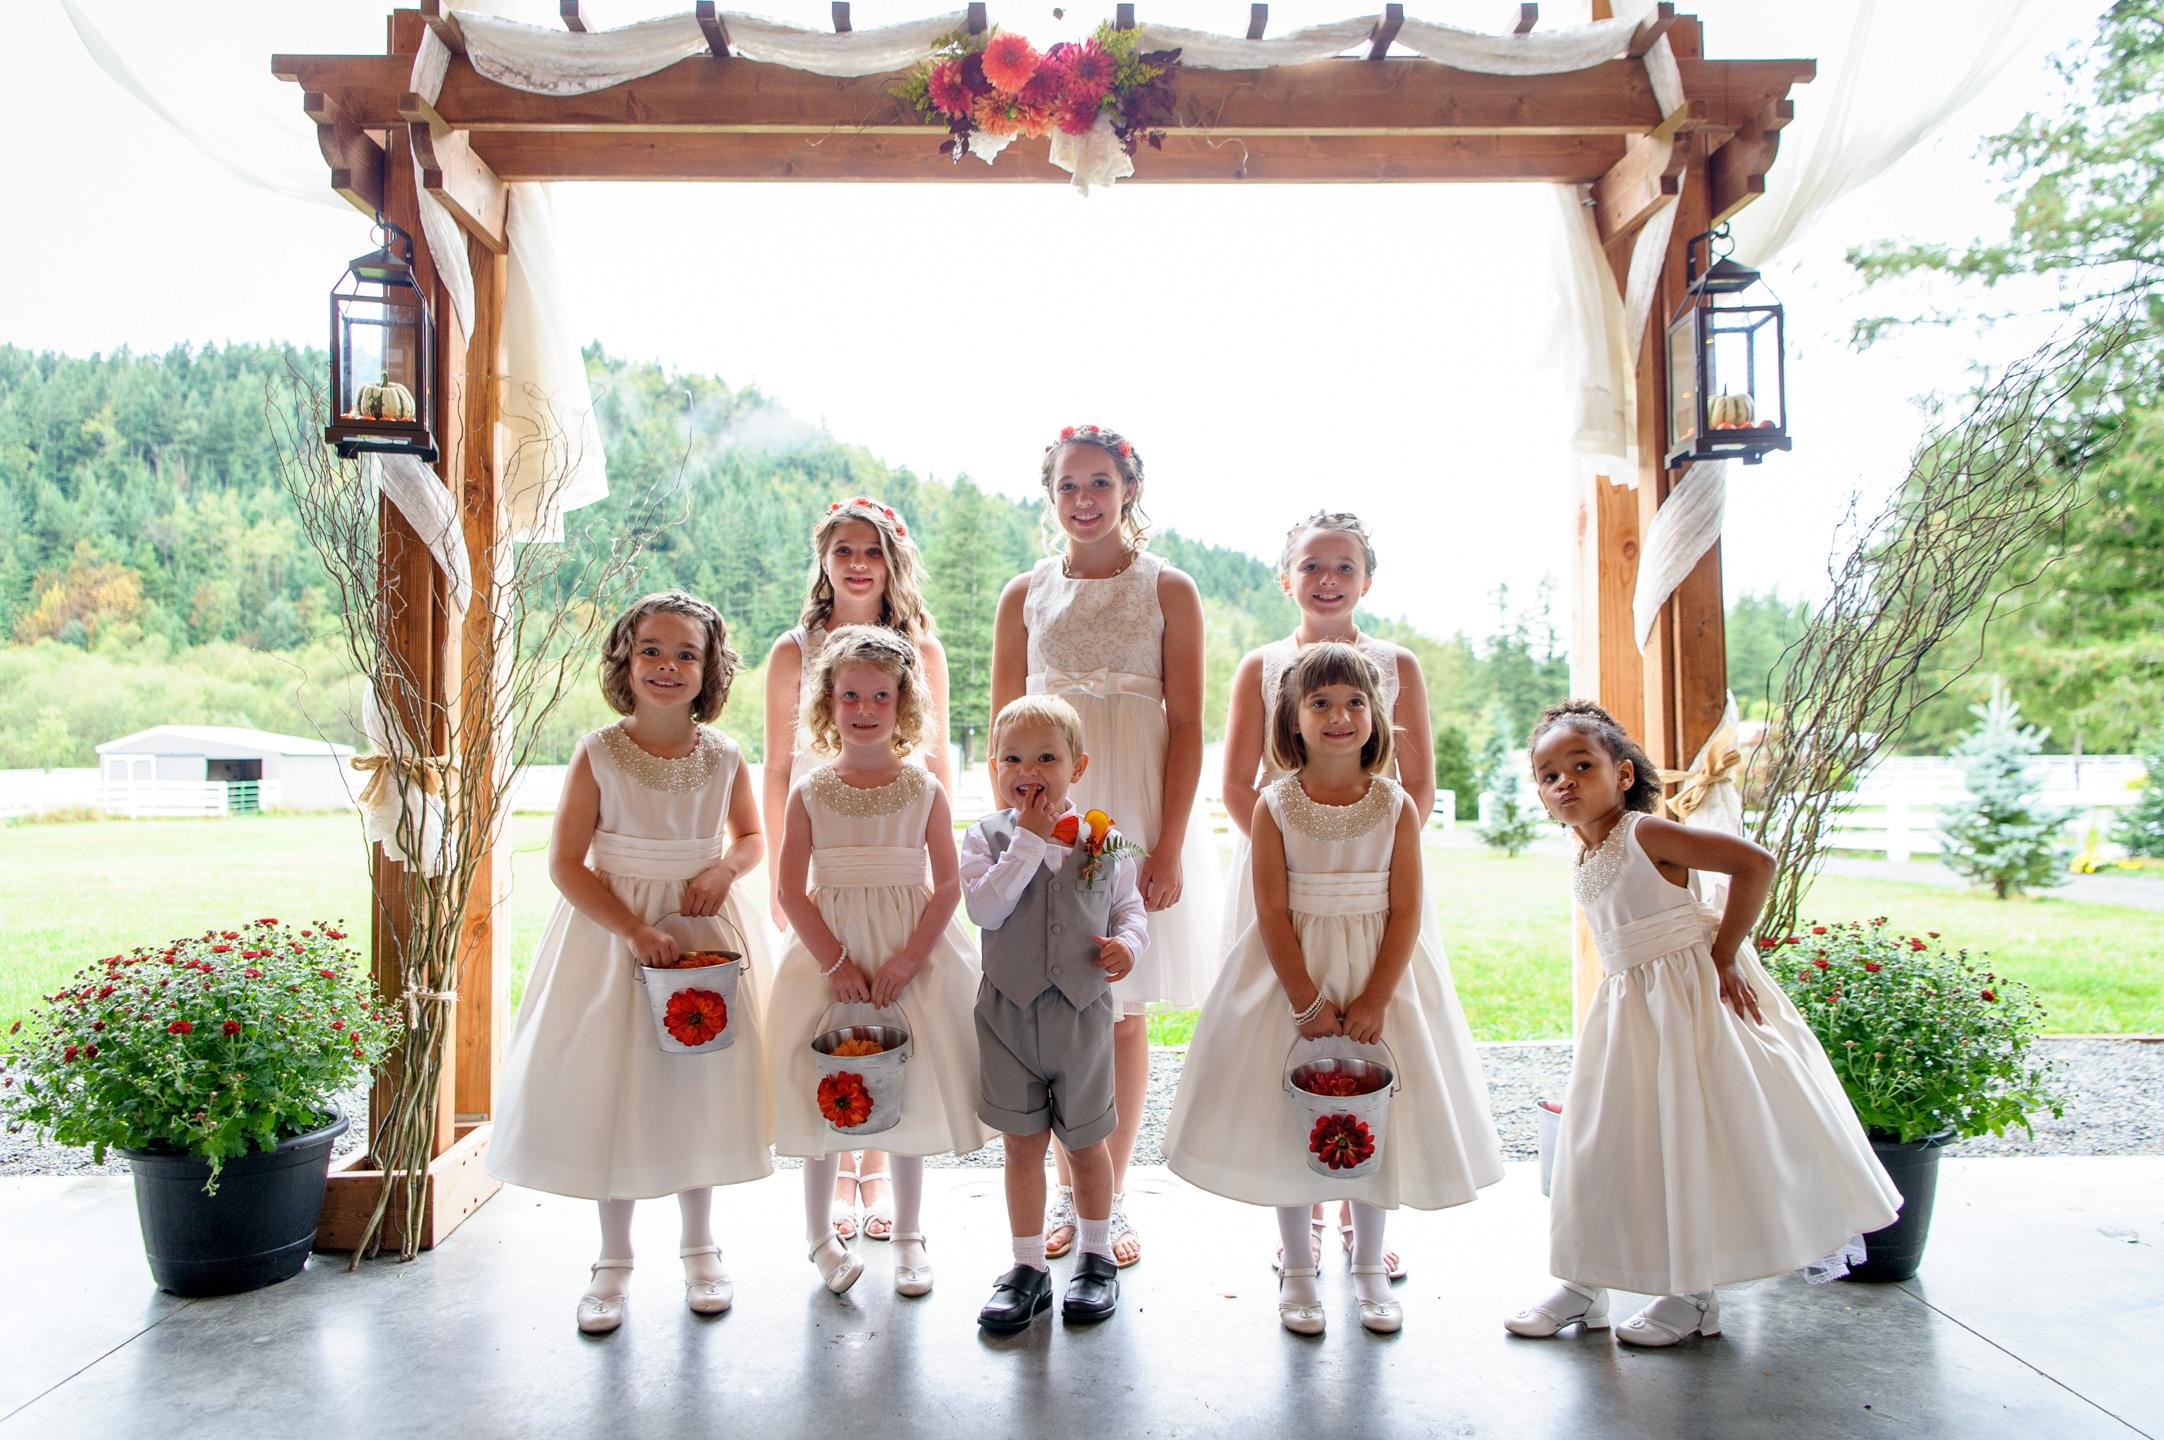 20160917_Tat_Renee and Marcus Wedding-33.jpg